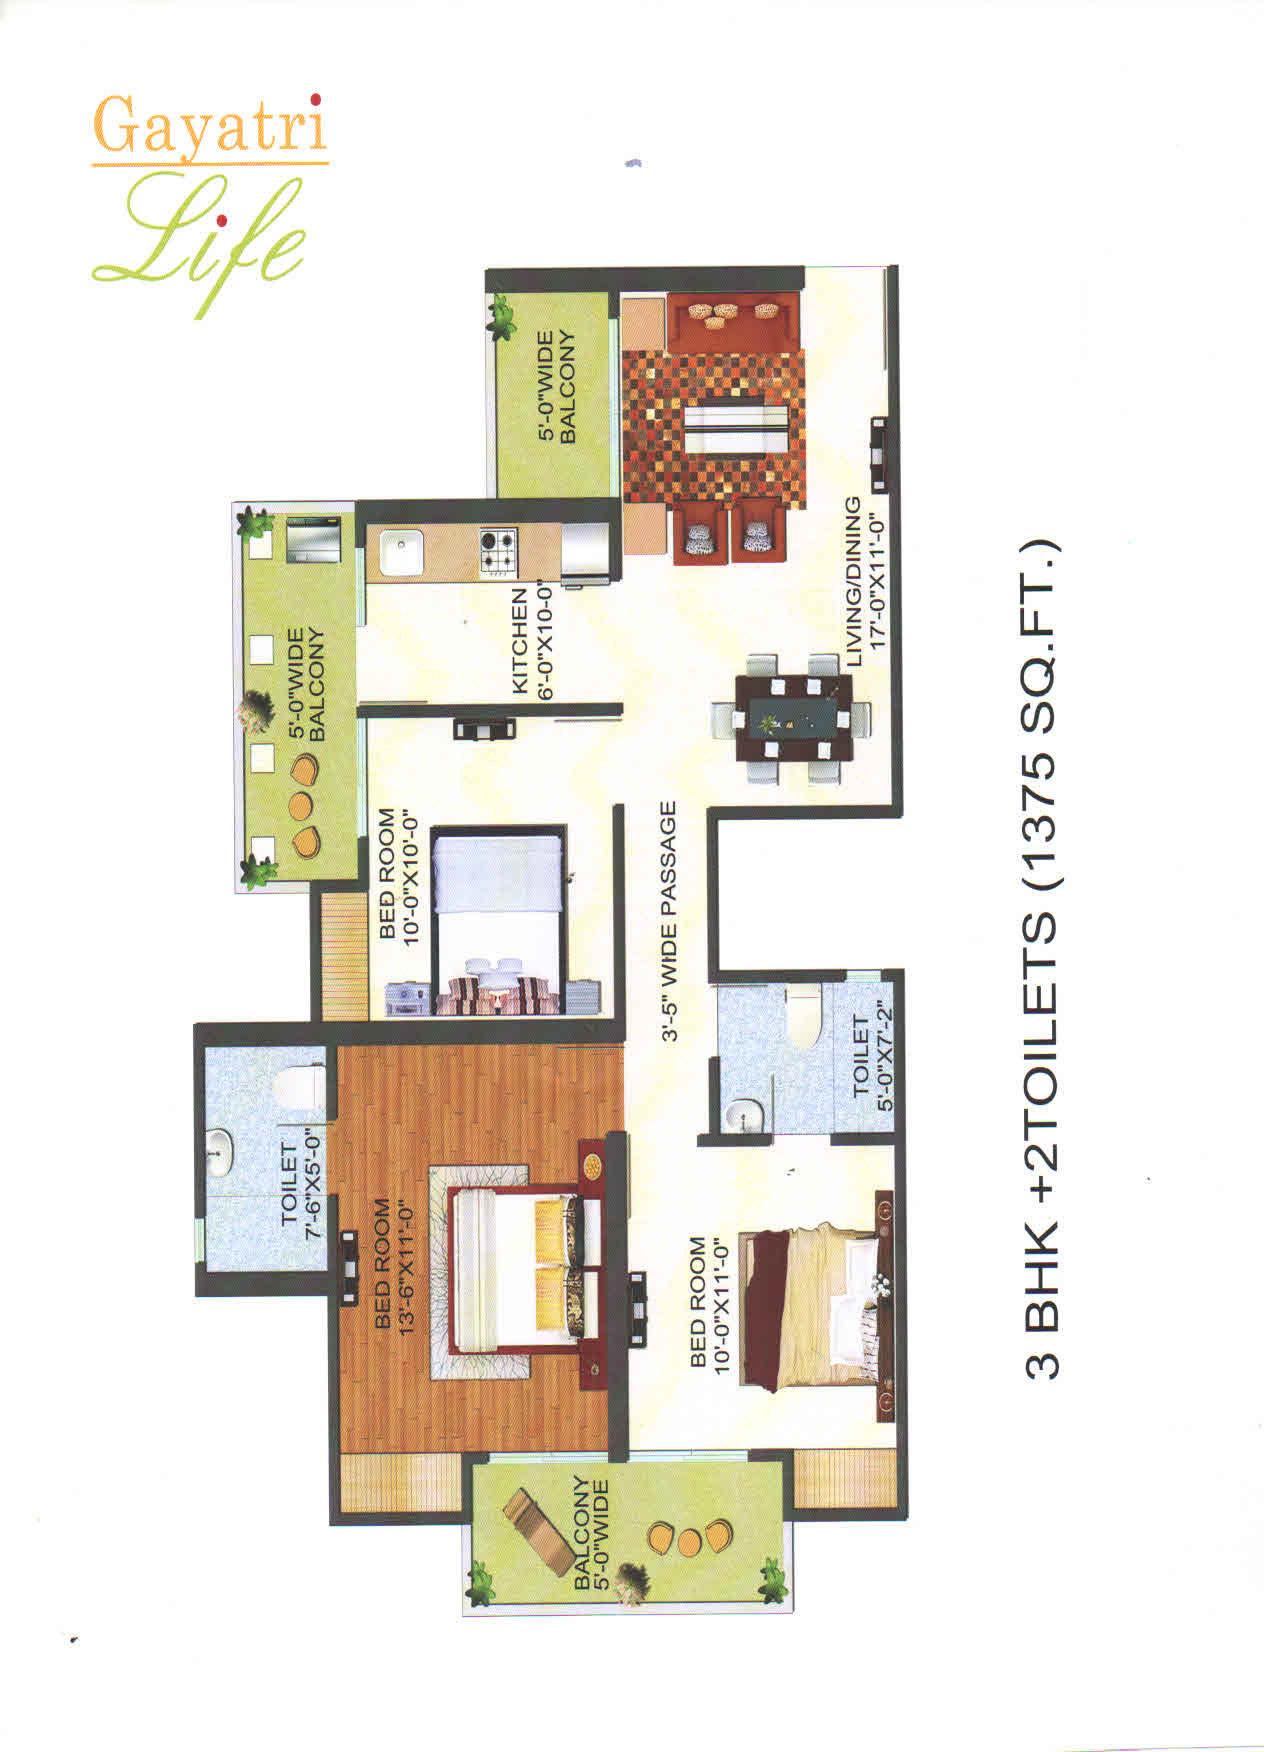 gayatri life floor plan5